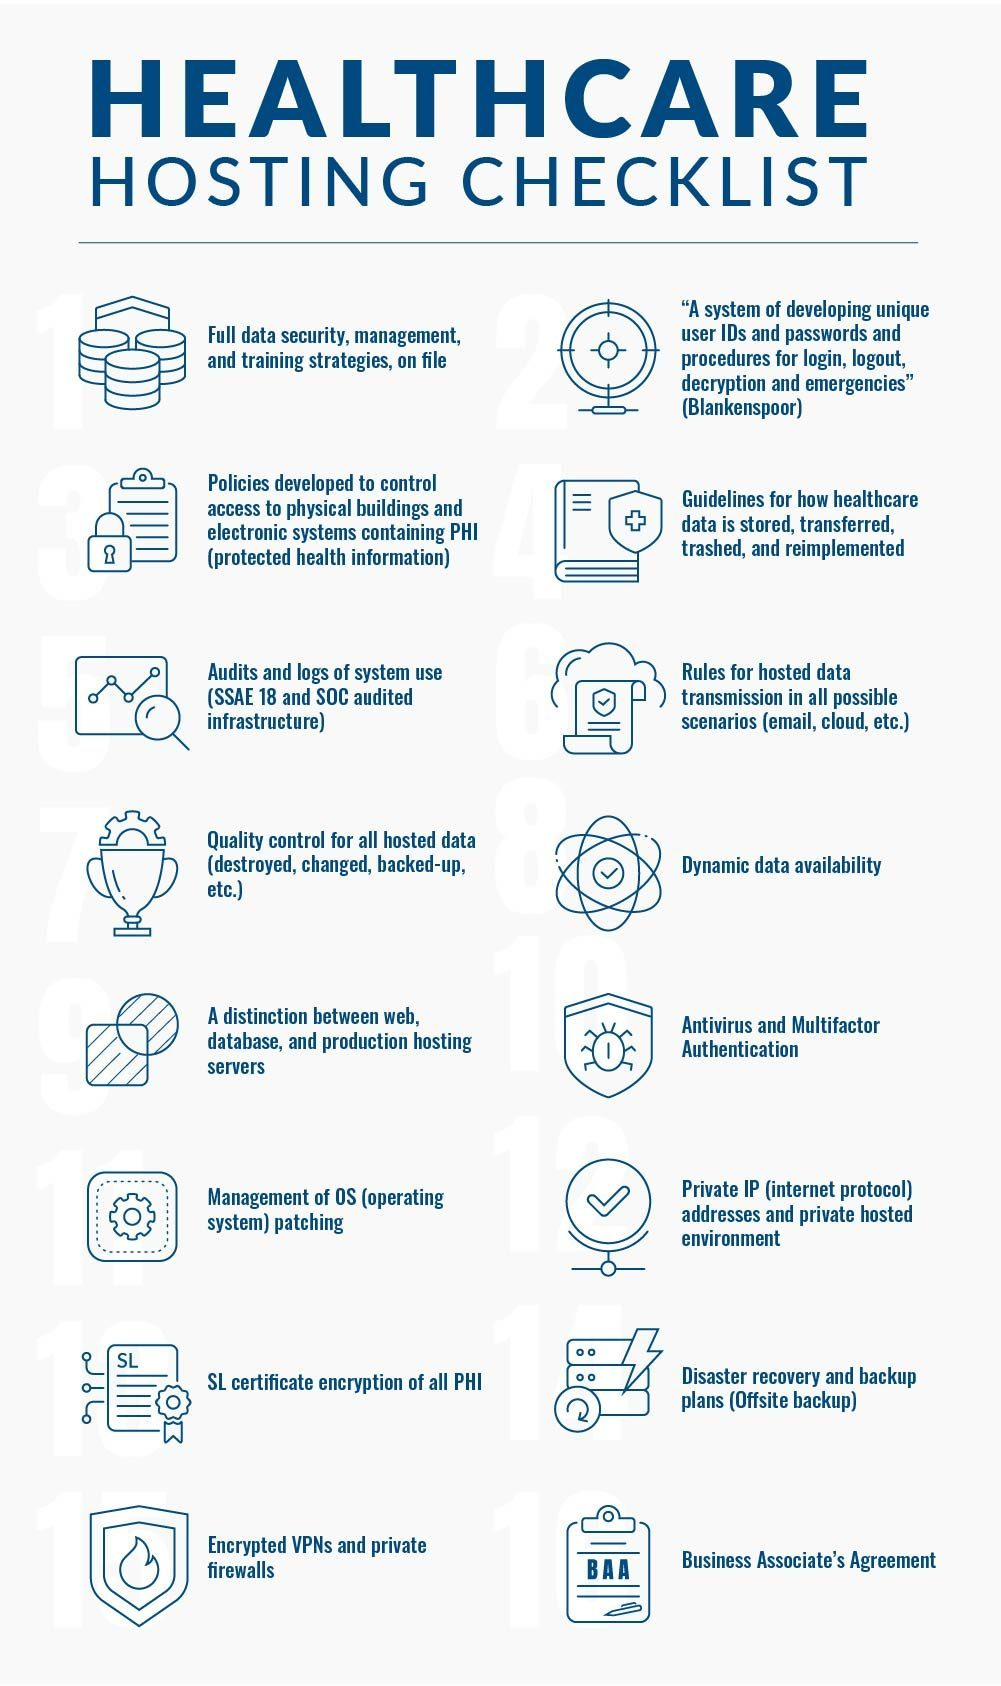 Healthcare Hosting Checklist